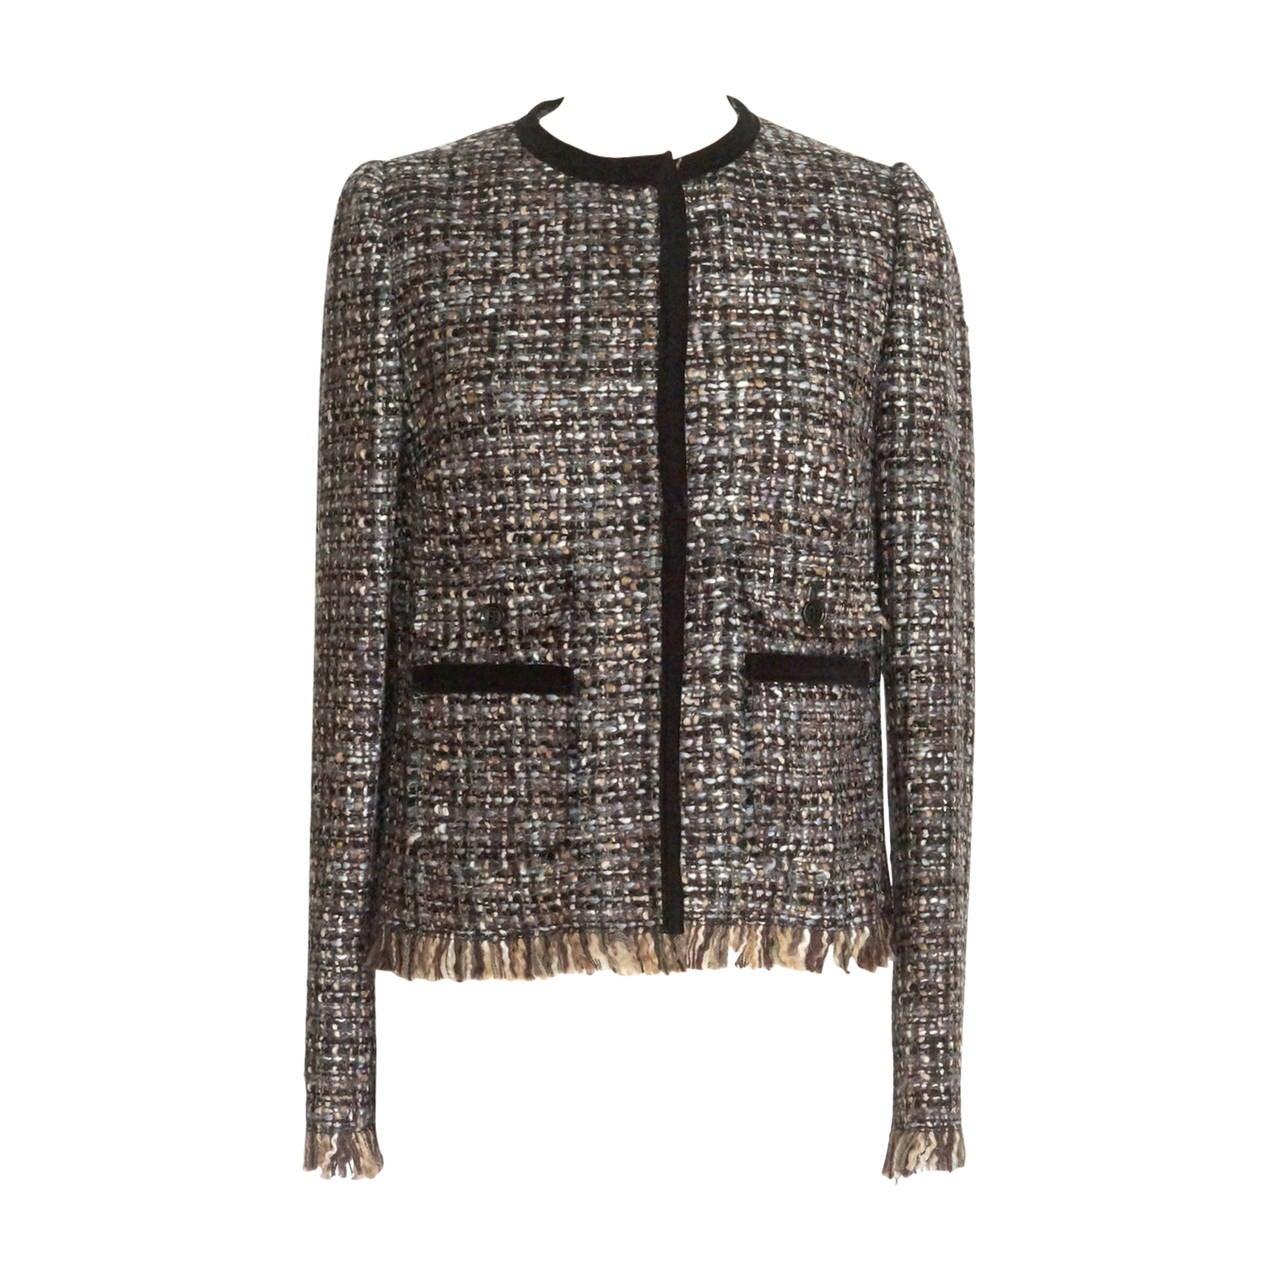 Dolce&Gabbana Jacket Fantasy Tweed Velvet Trim Fringe Hem 44 / 8